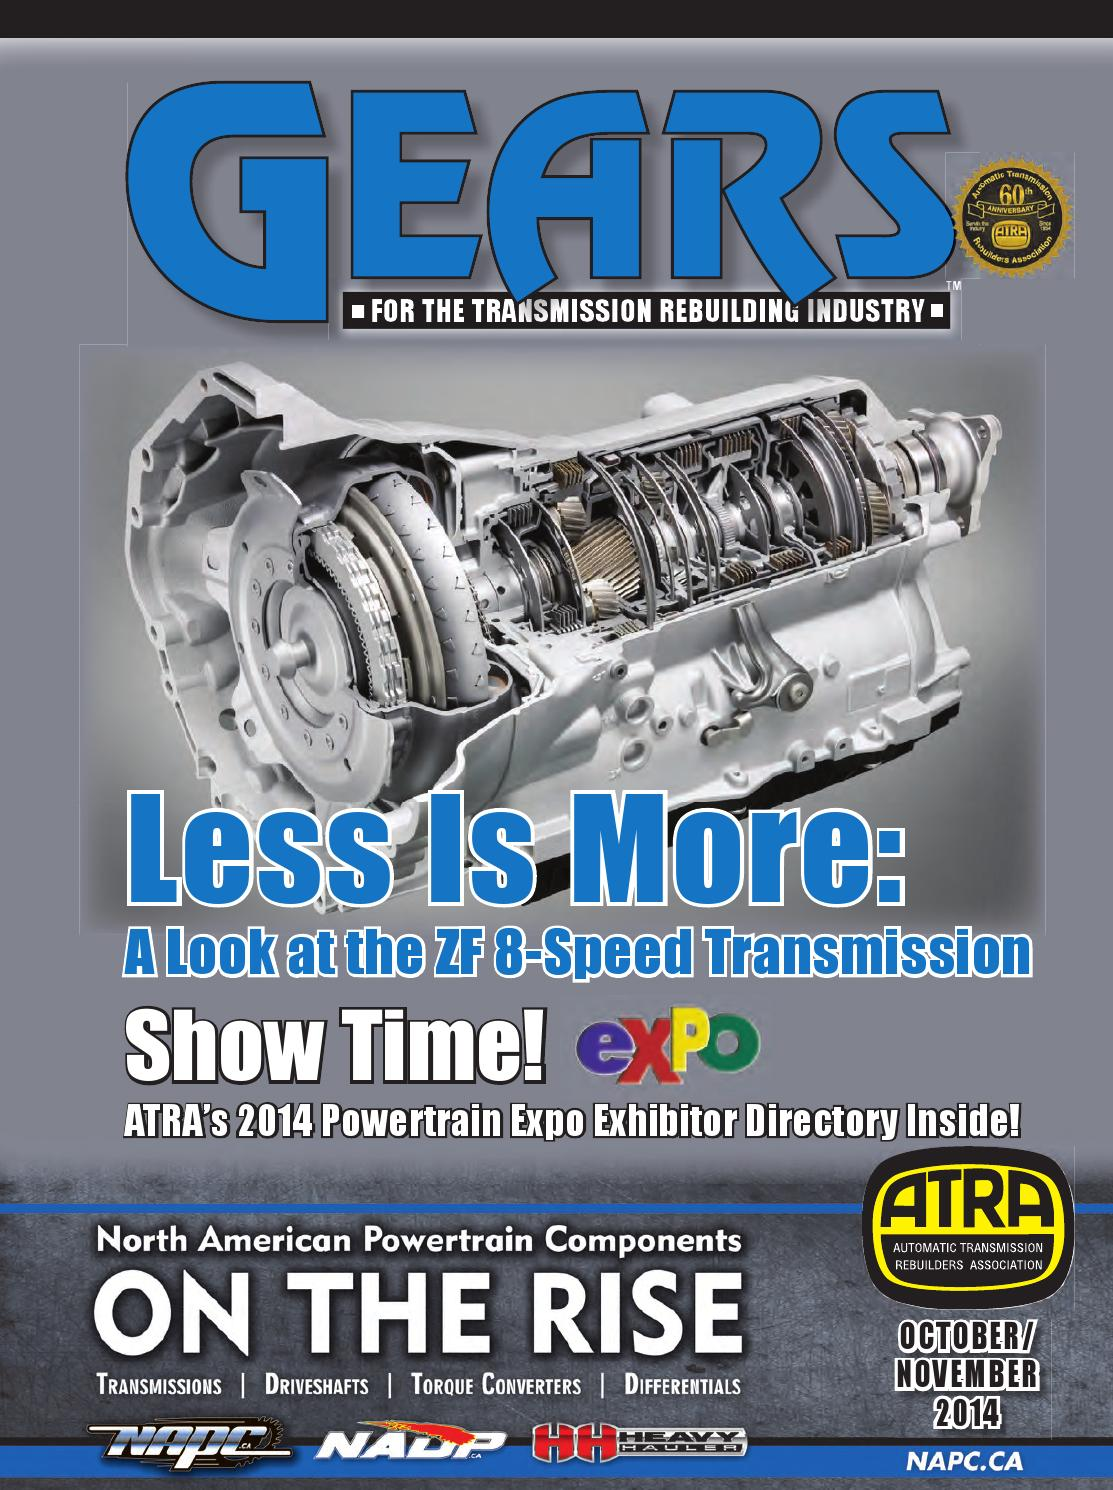 GEARS magazine Oct/Nov 2014 by Diane Bland - issuu